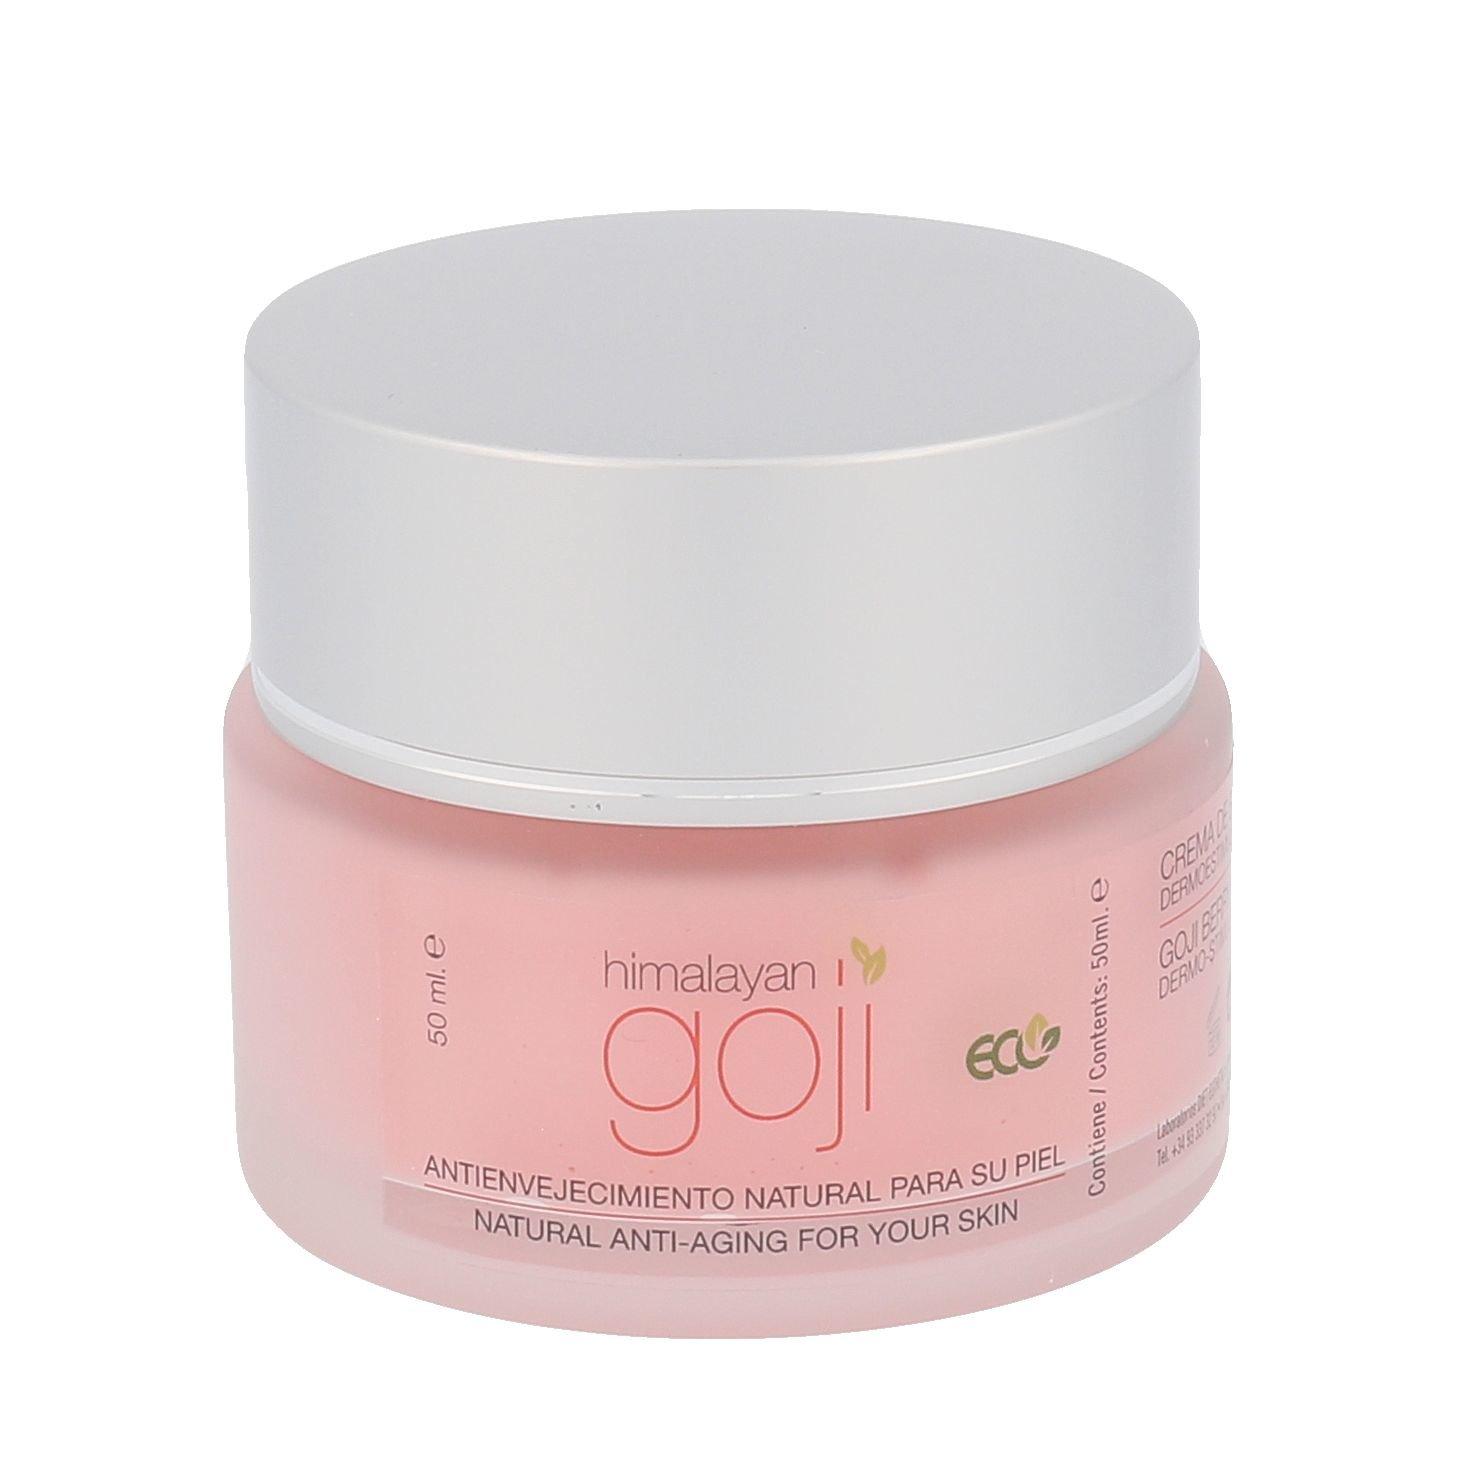 Diet Esthetic Himalayan Goji Day Cream 50ml